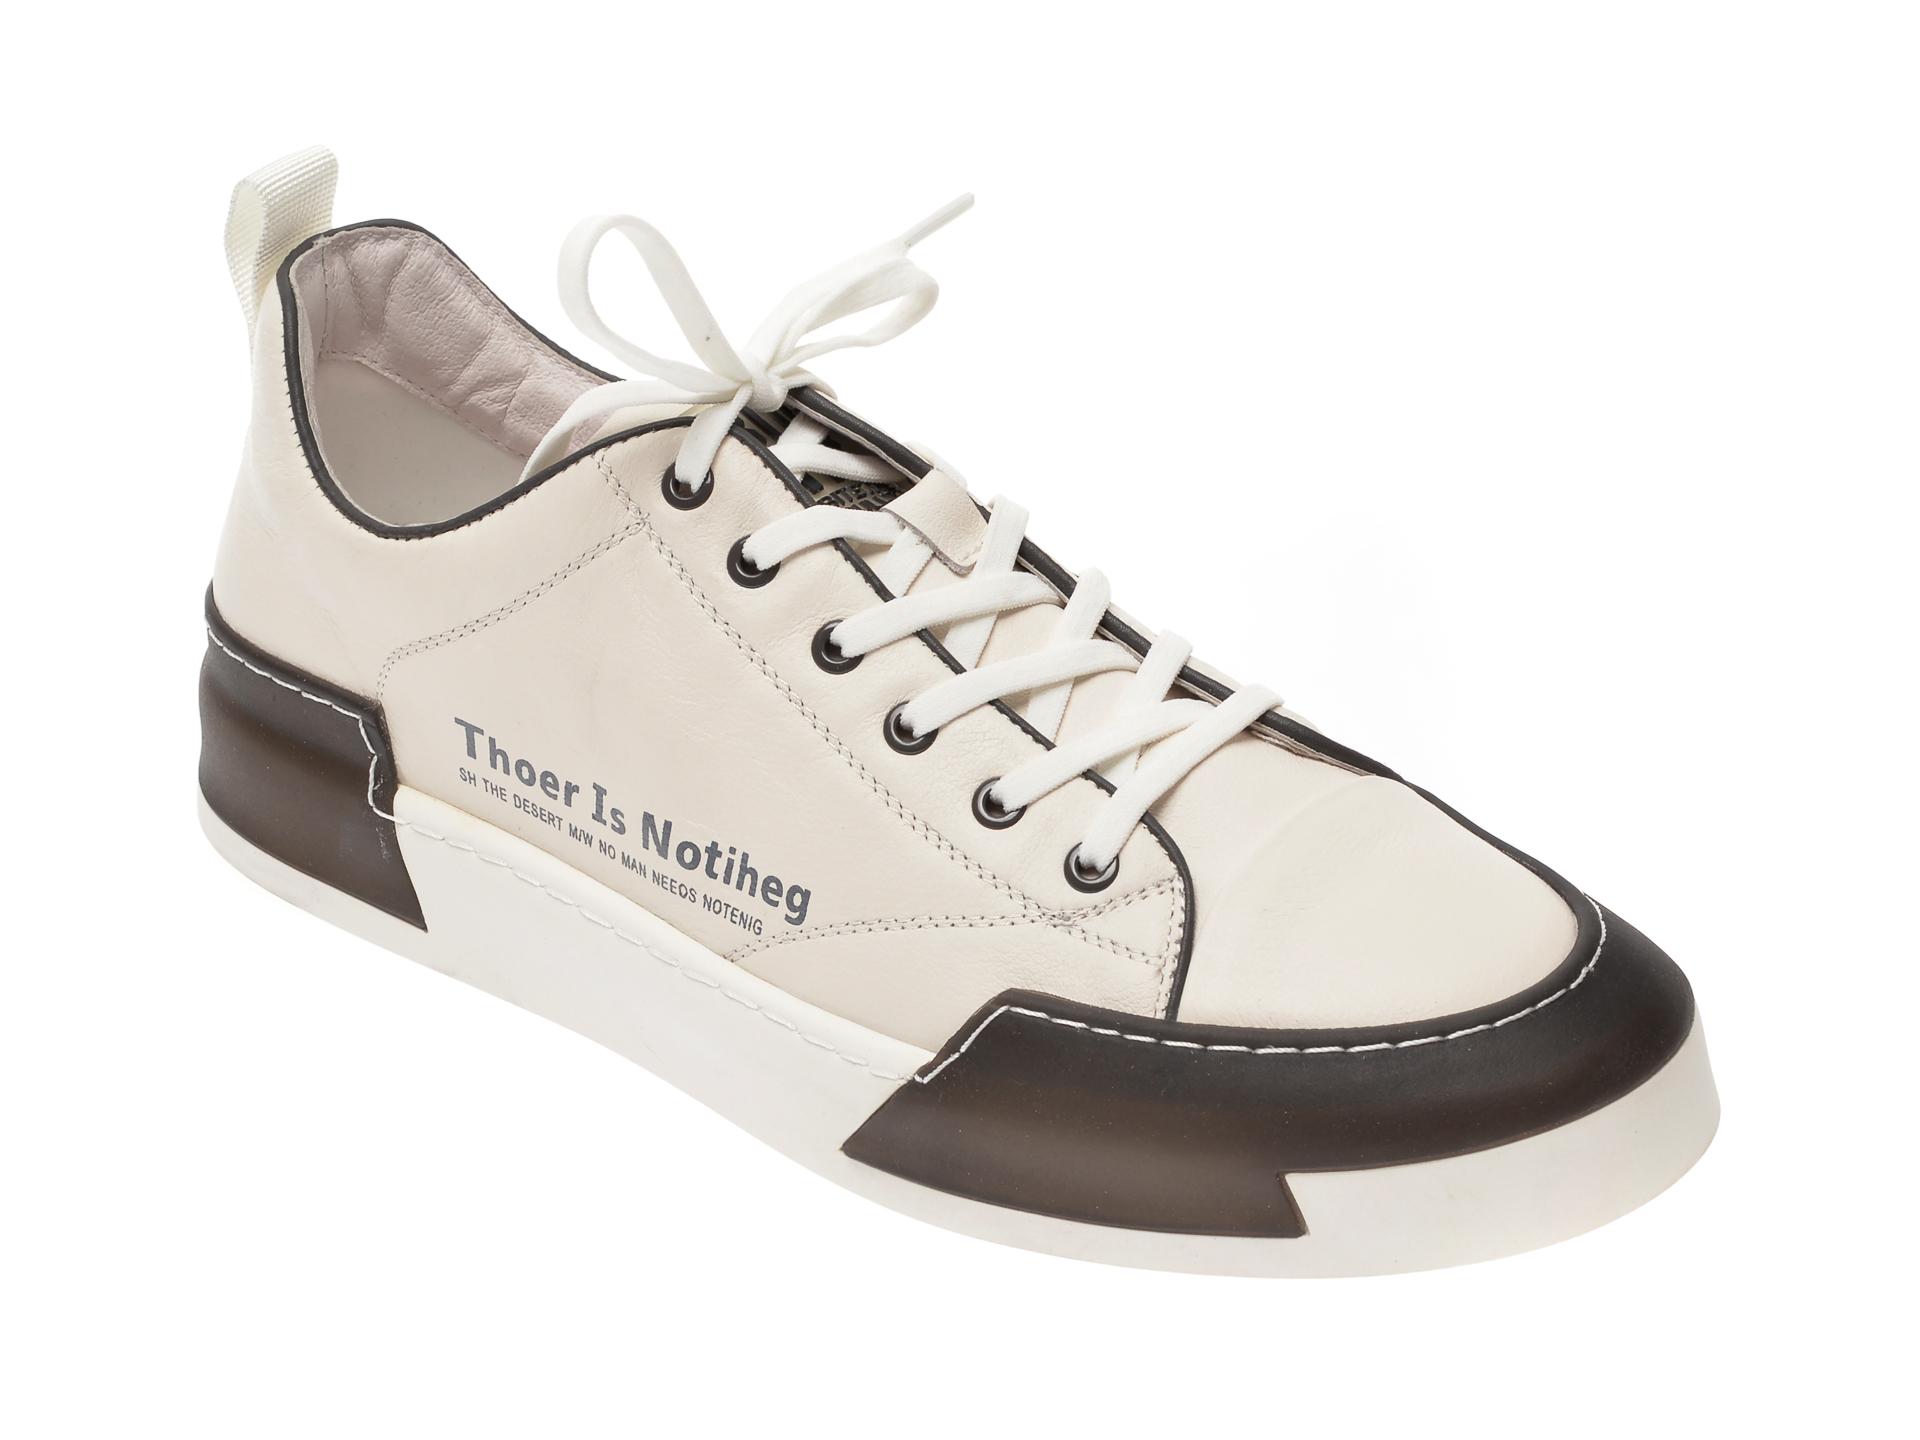 Pantofi BITE THE BULLET albi, 22069, din piele naturala imagine